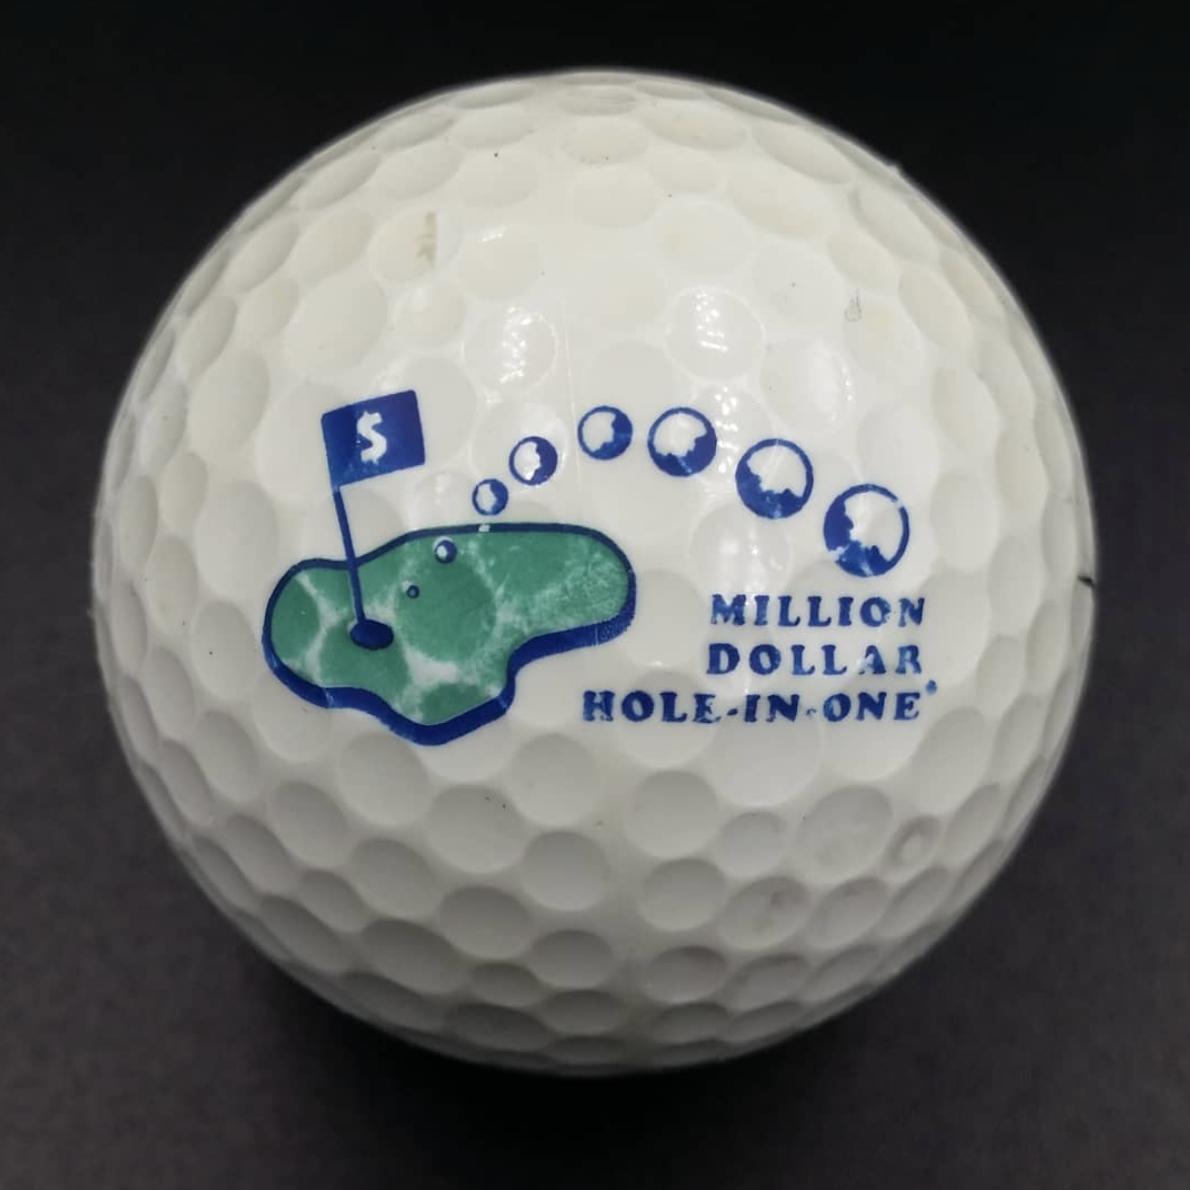 Someone S Million Dollars Hope Sank In The Lake Lakeballs Dubaigolf Golfuae Golfabudhabi Golfballs Golfingaround Go Golf Ball Dubai Golf Golf